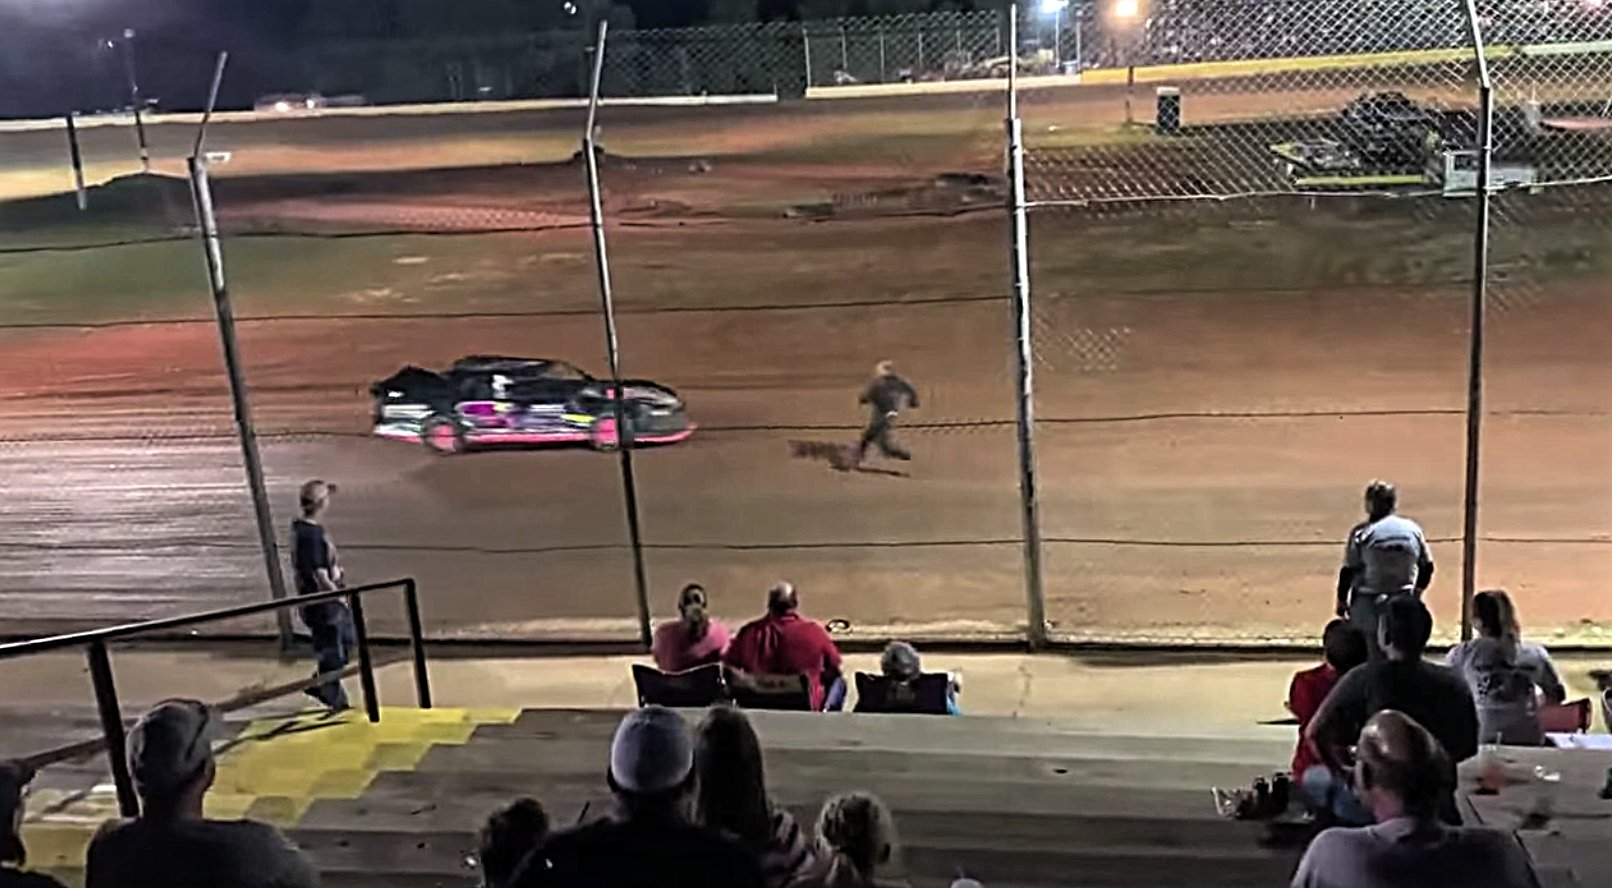 Racing driver breaks leg